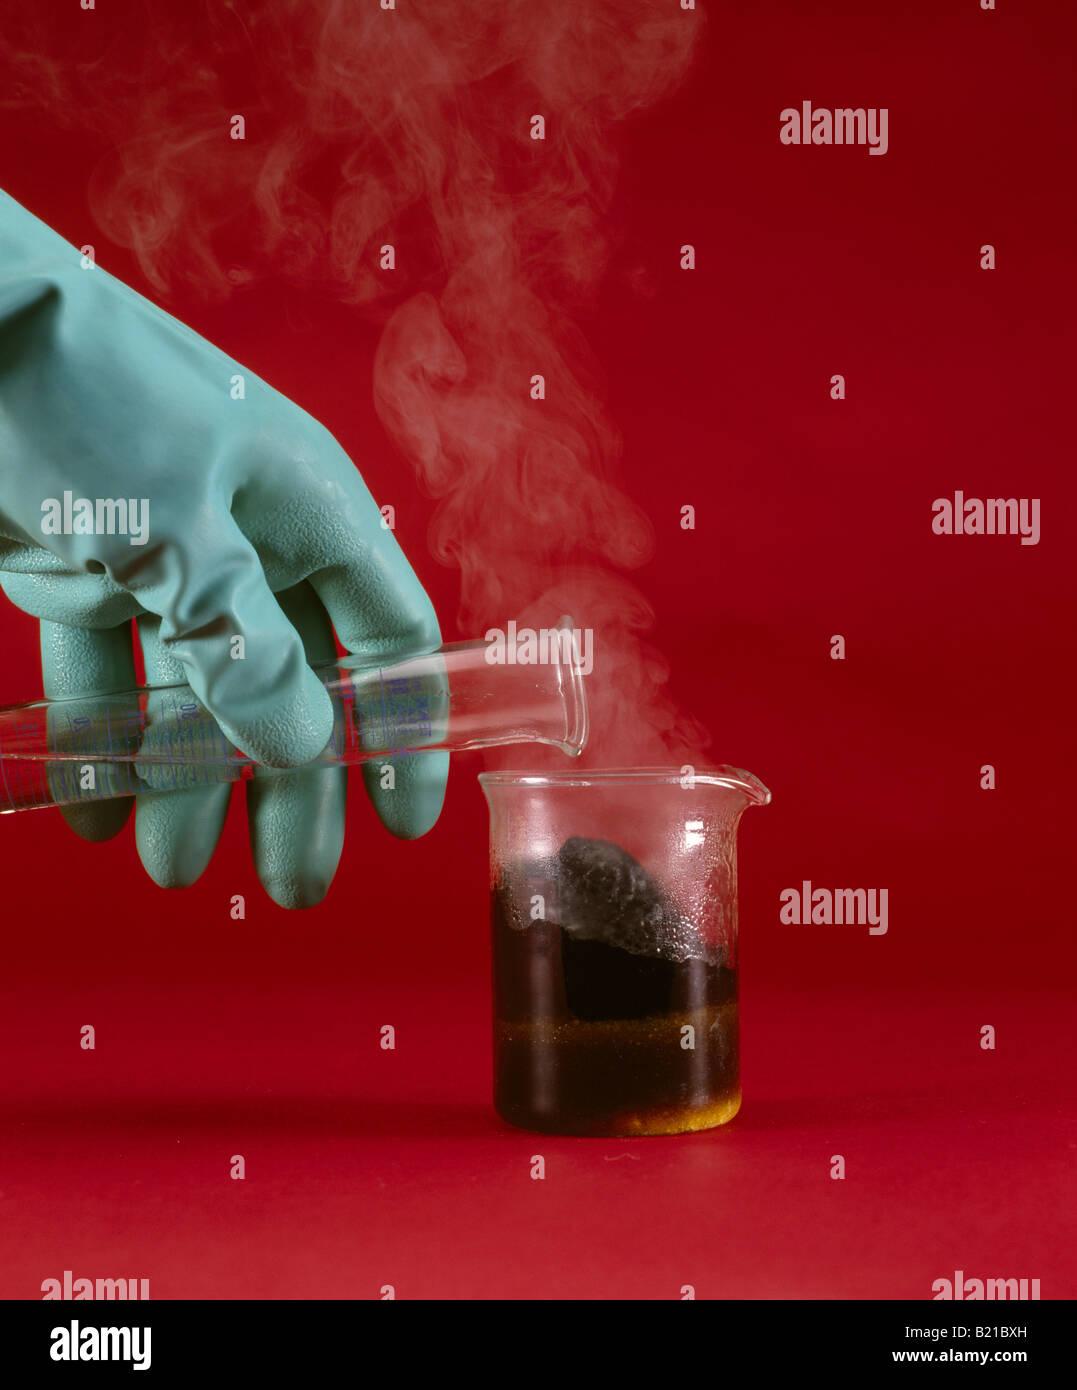 Sulfuric Acid Stock Photos & Sulfuric Acid Stock Images - Alamy